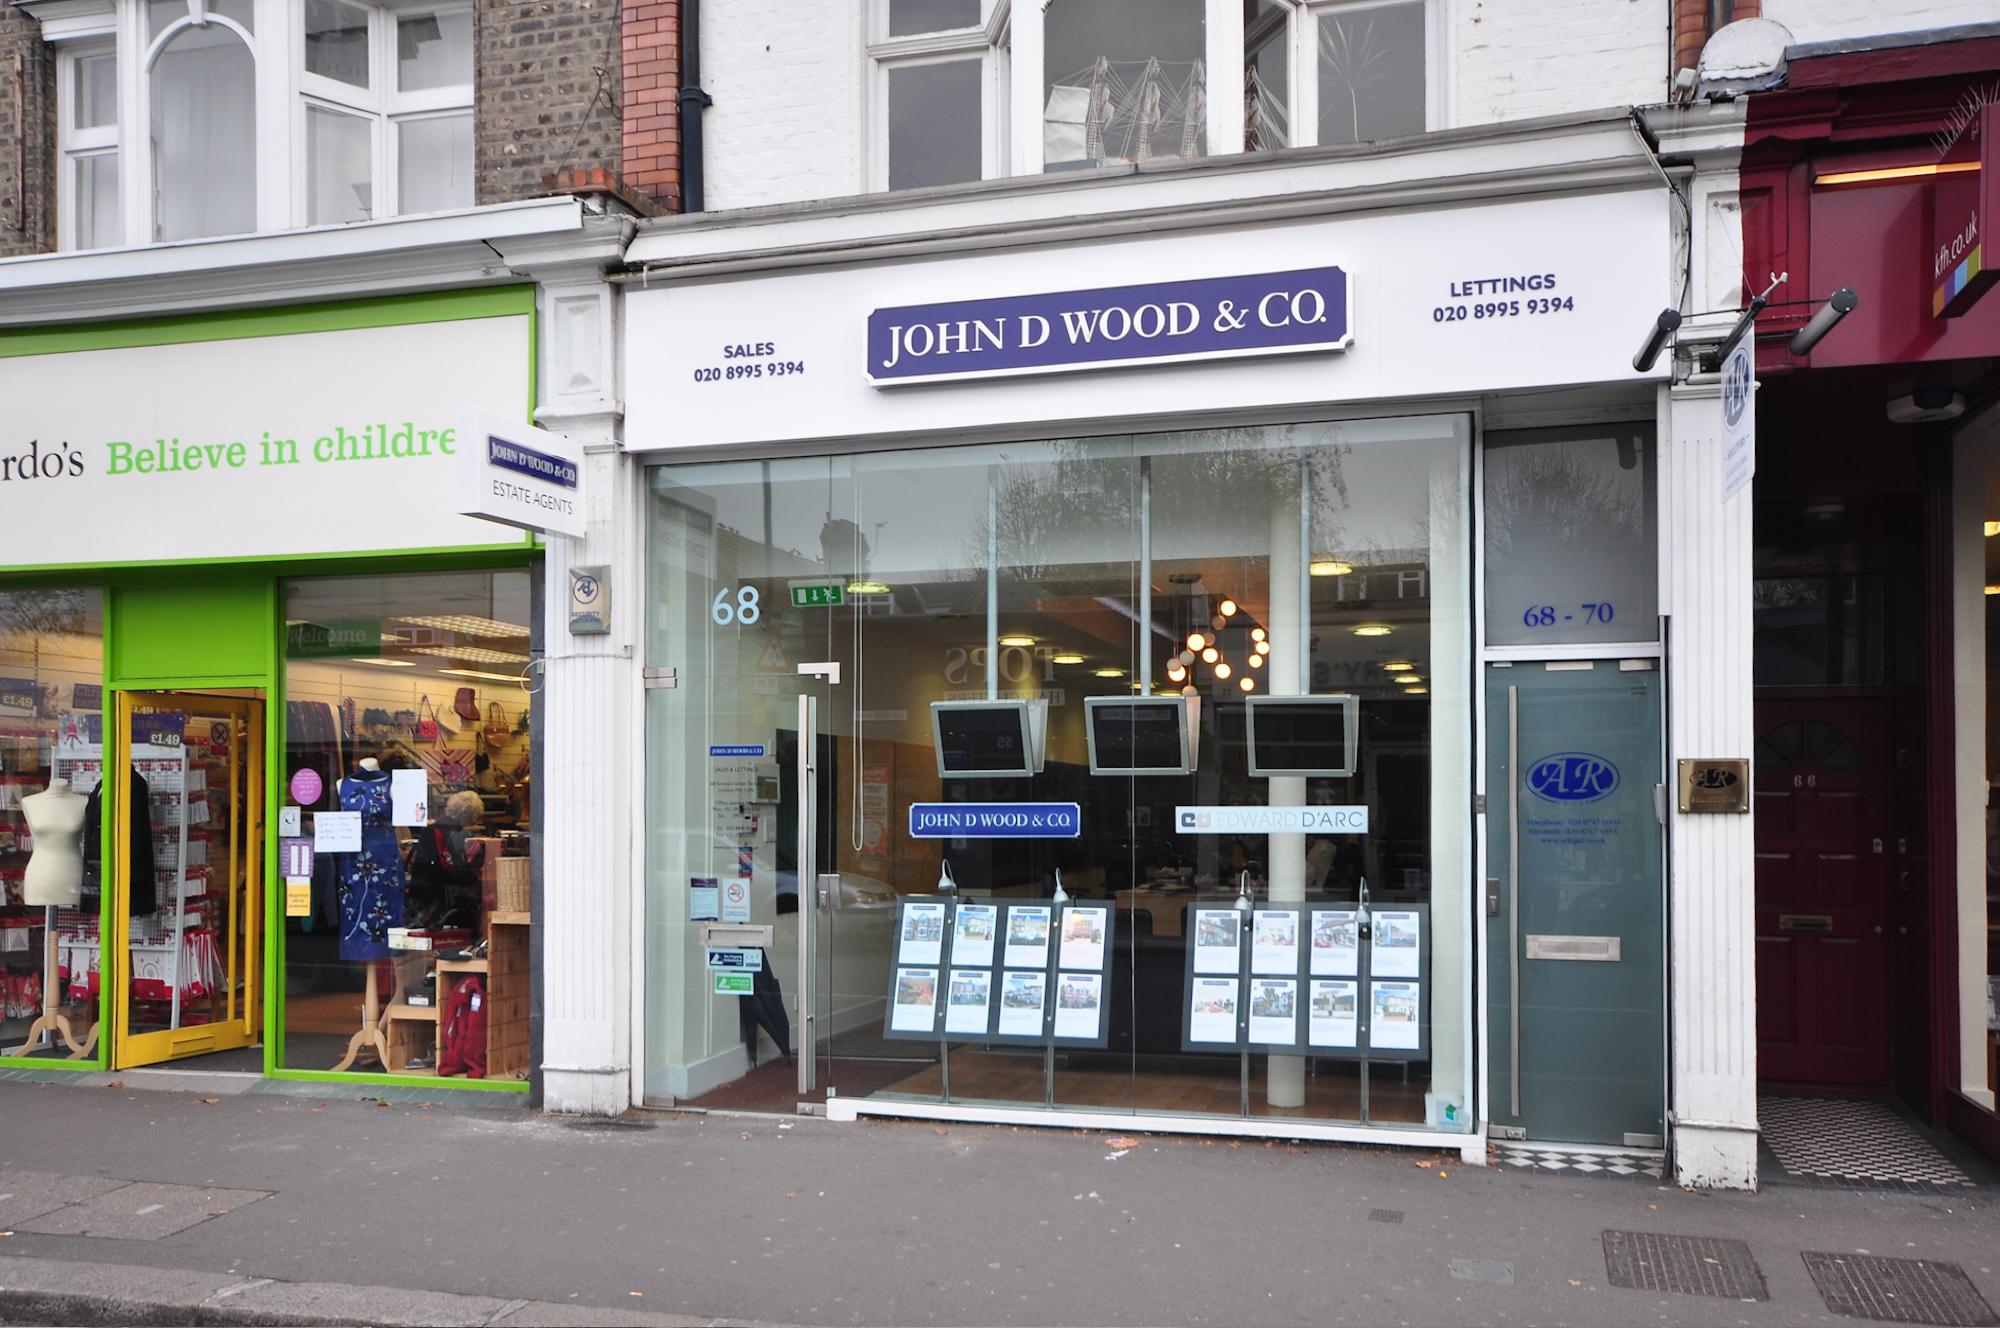 John D Wood & Co Estate Agents Chiswick